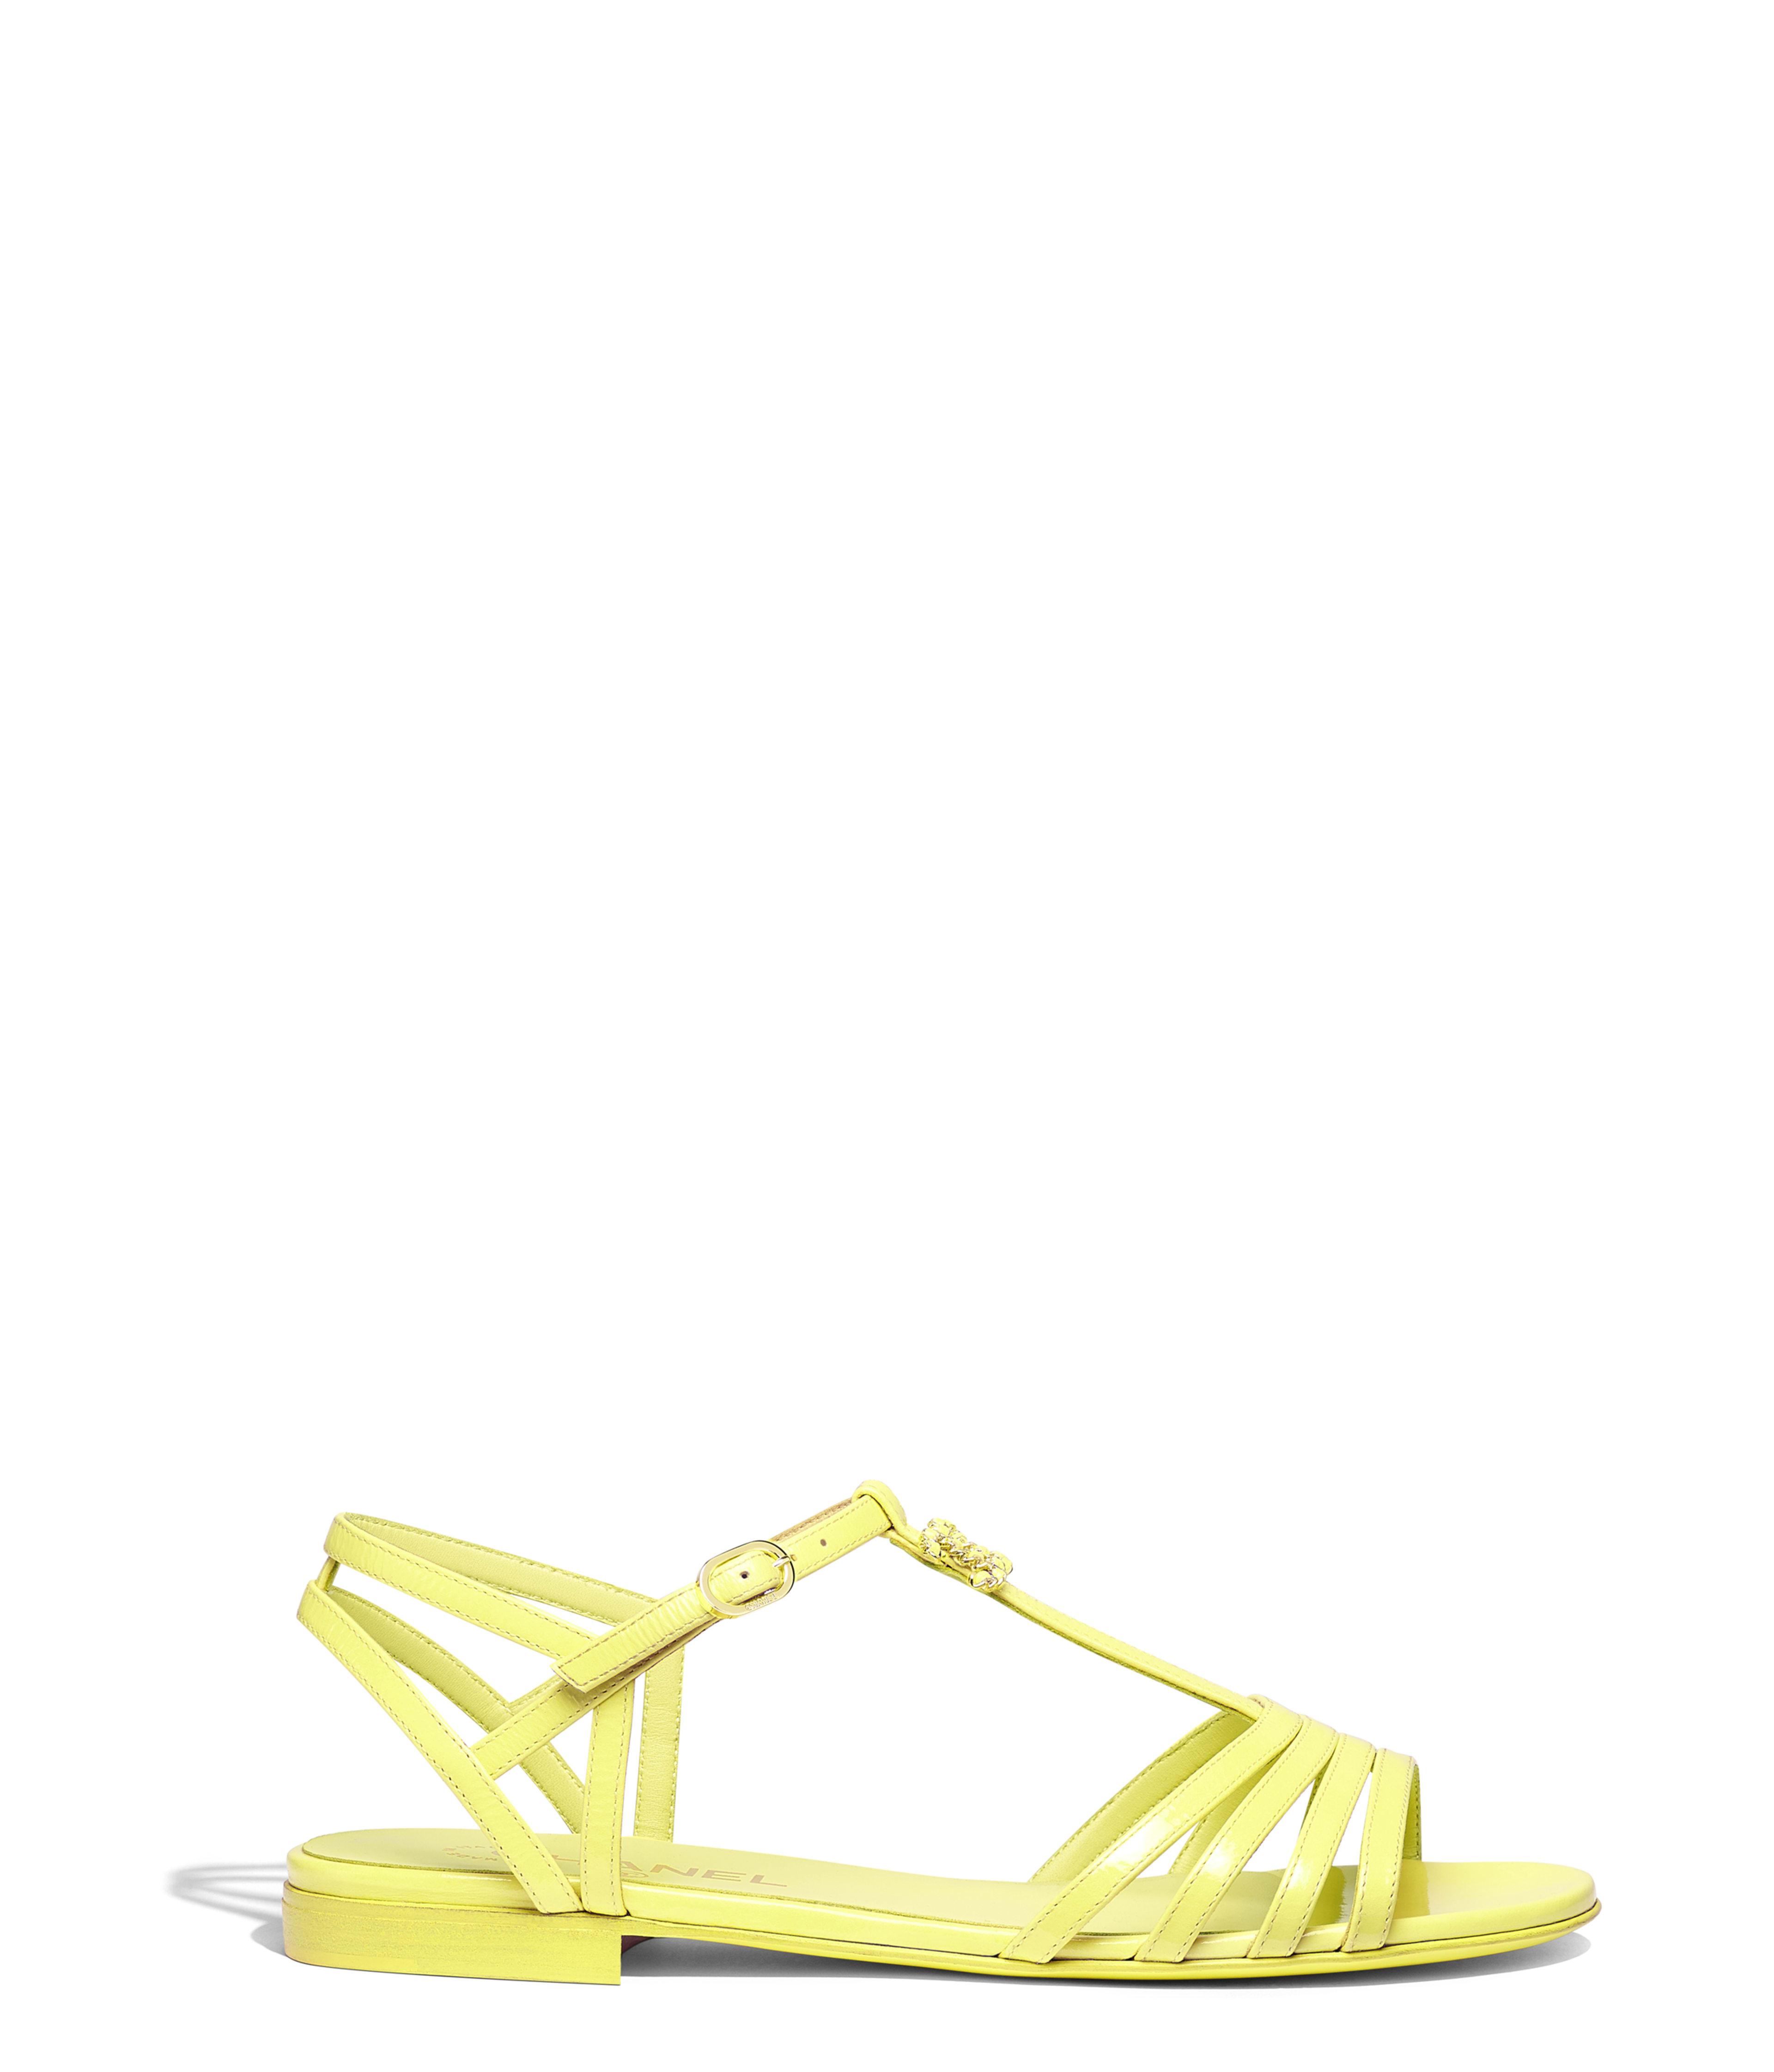 347881430 Sandals Patent Goatskin